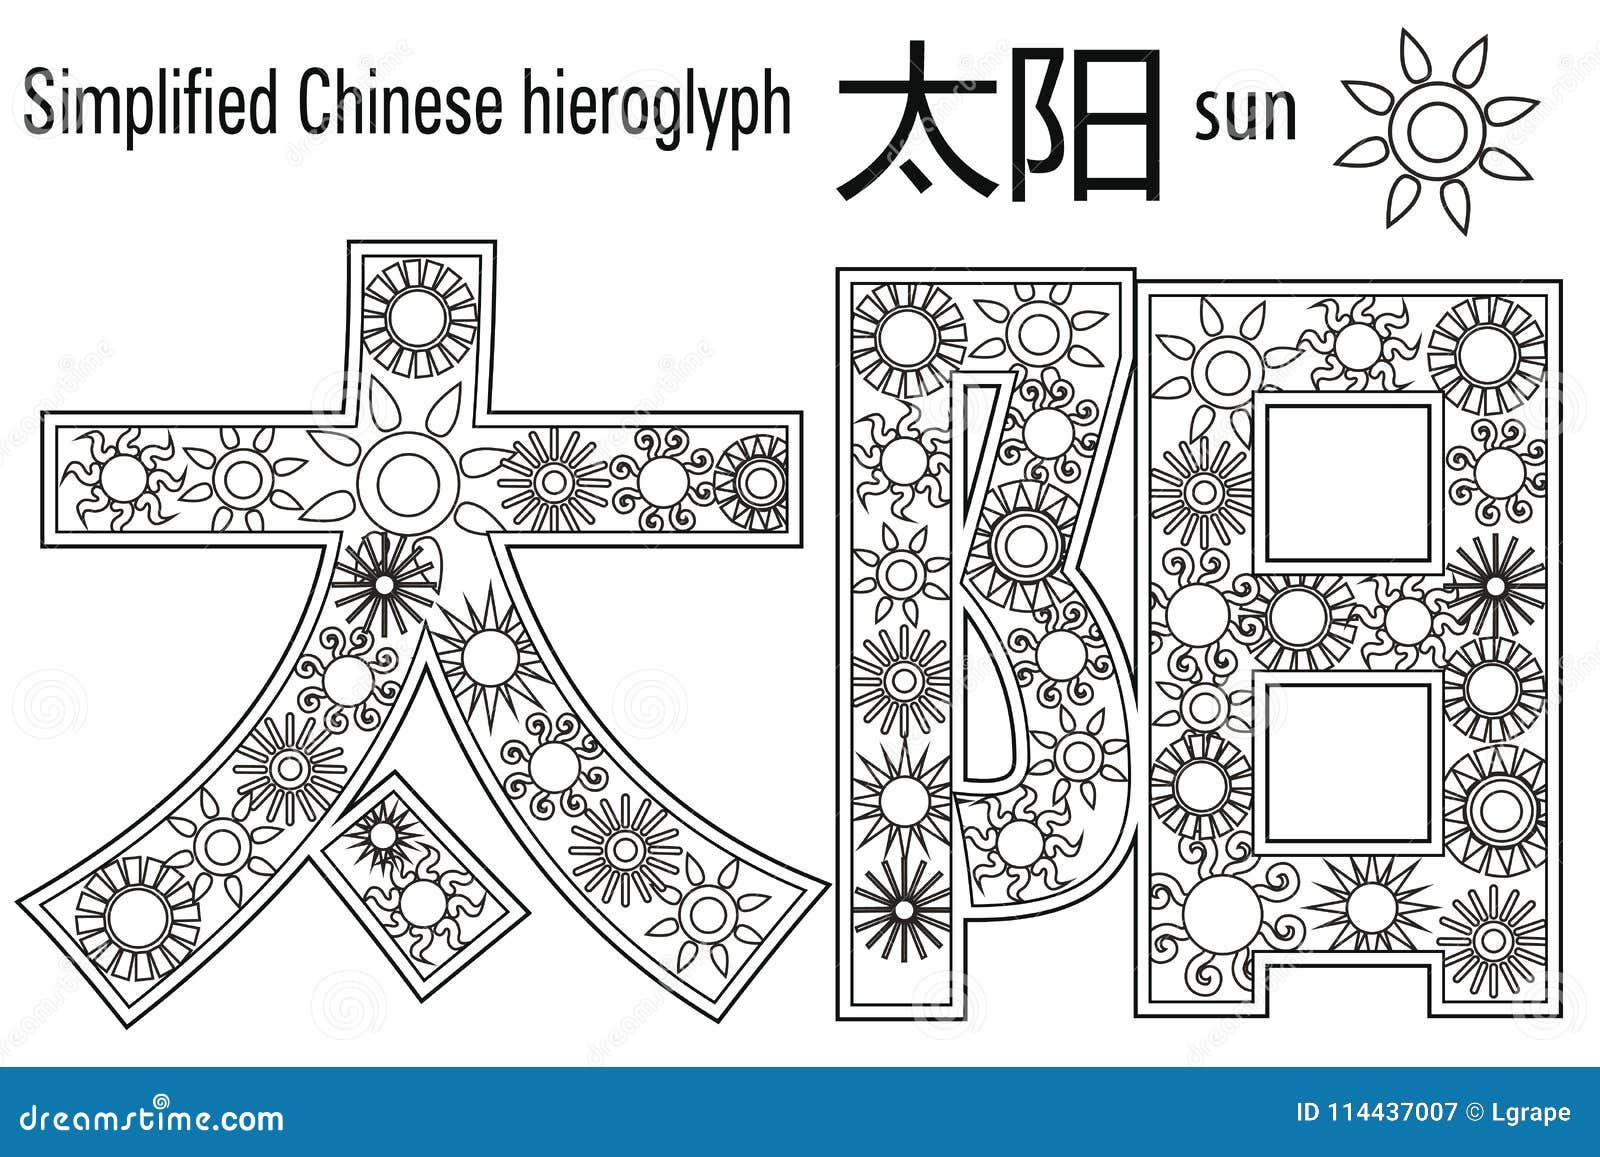 Color Therapy Anti Stress Coloring Book Hieroglyph Sun Learn